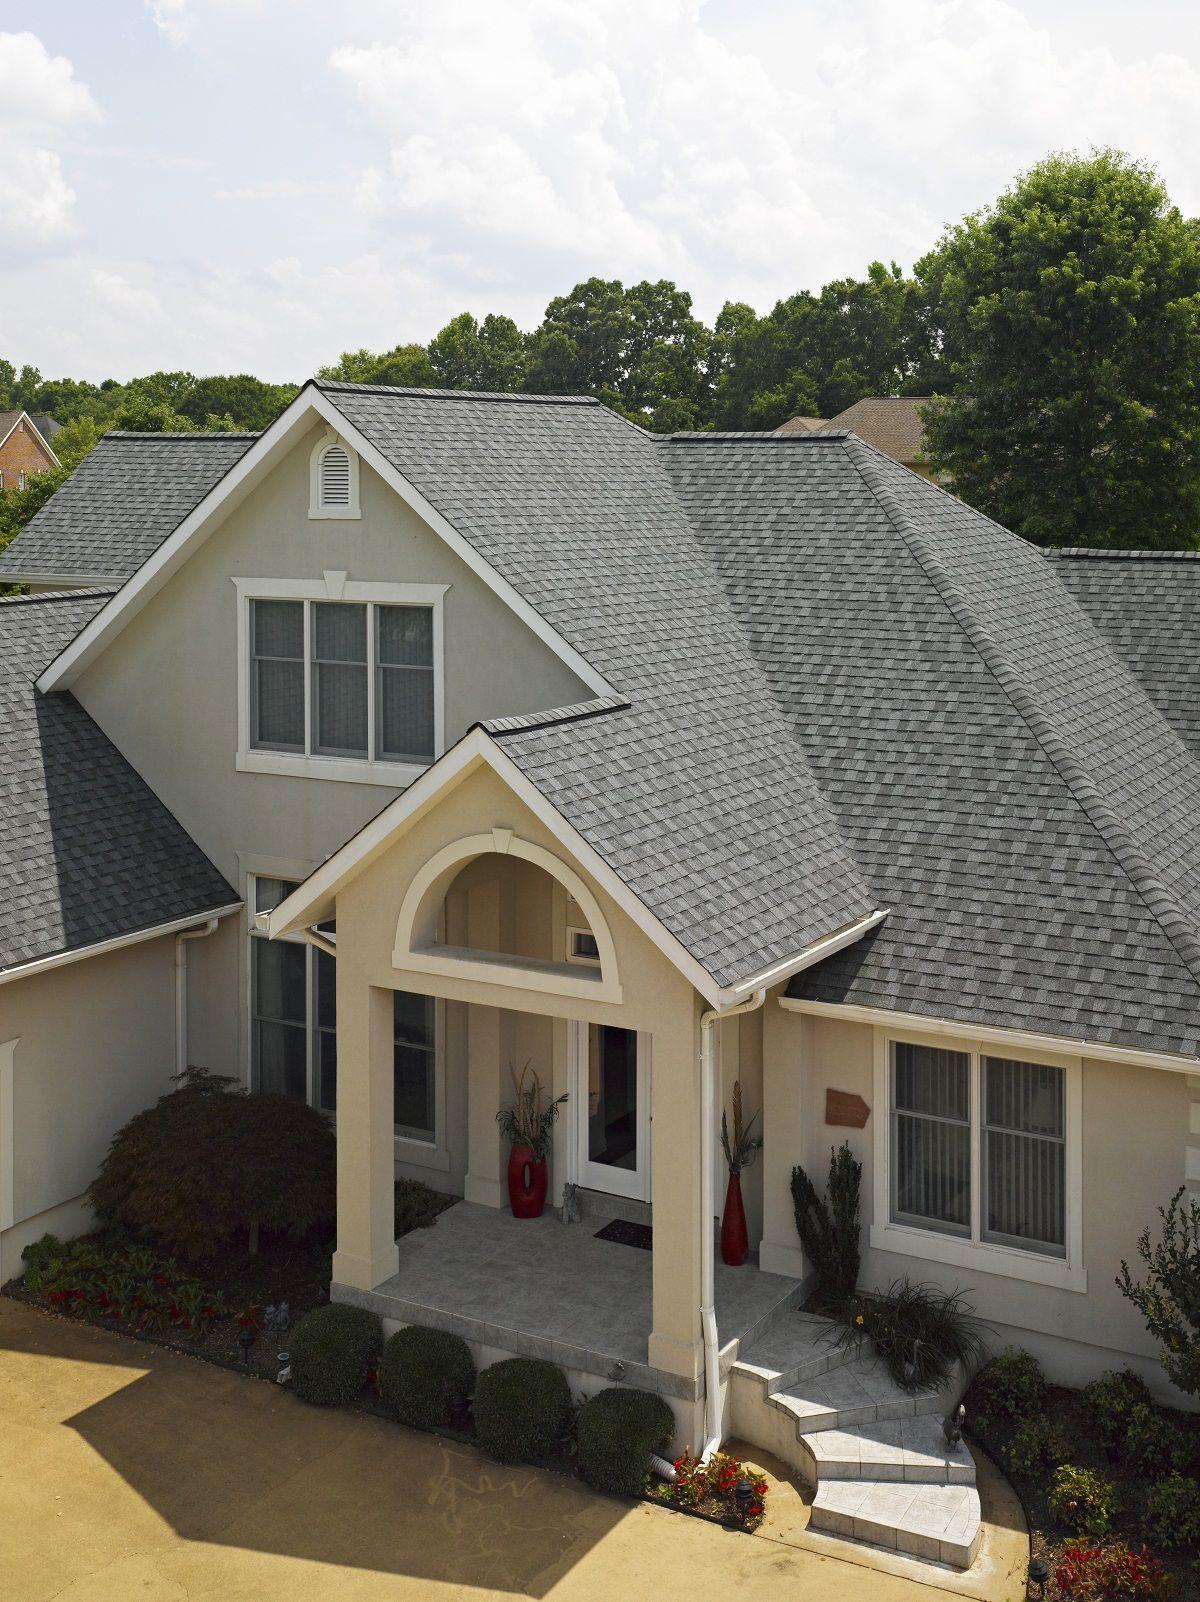 Best 5 Brisk Cool Ideas Roofing Tiles Side Return Communal 400 x 300